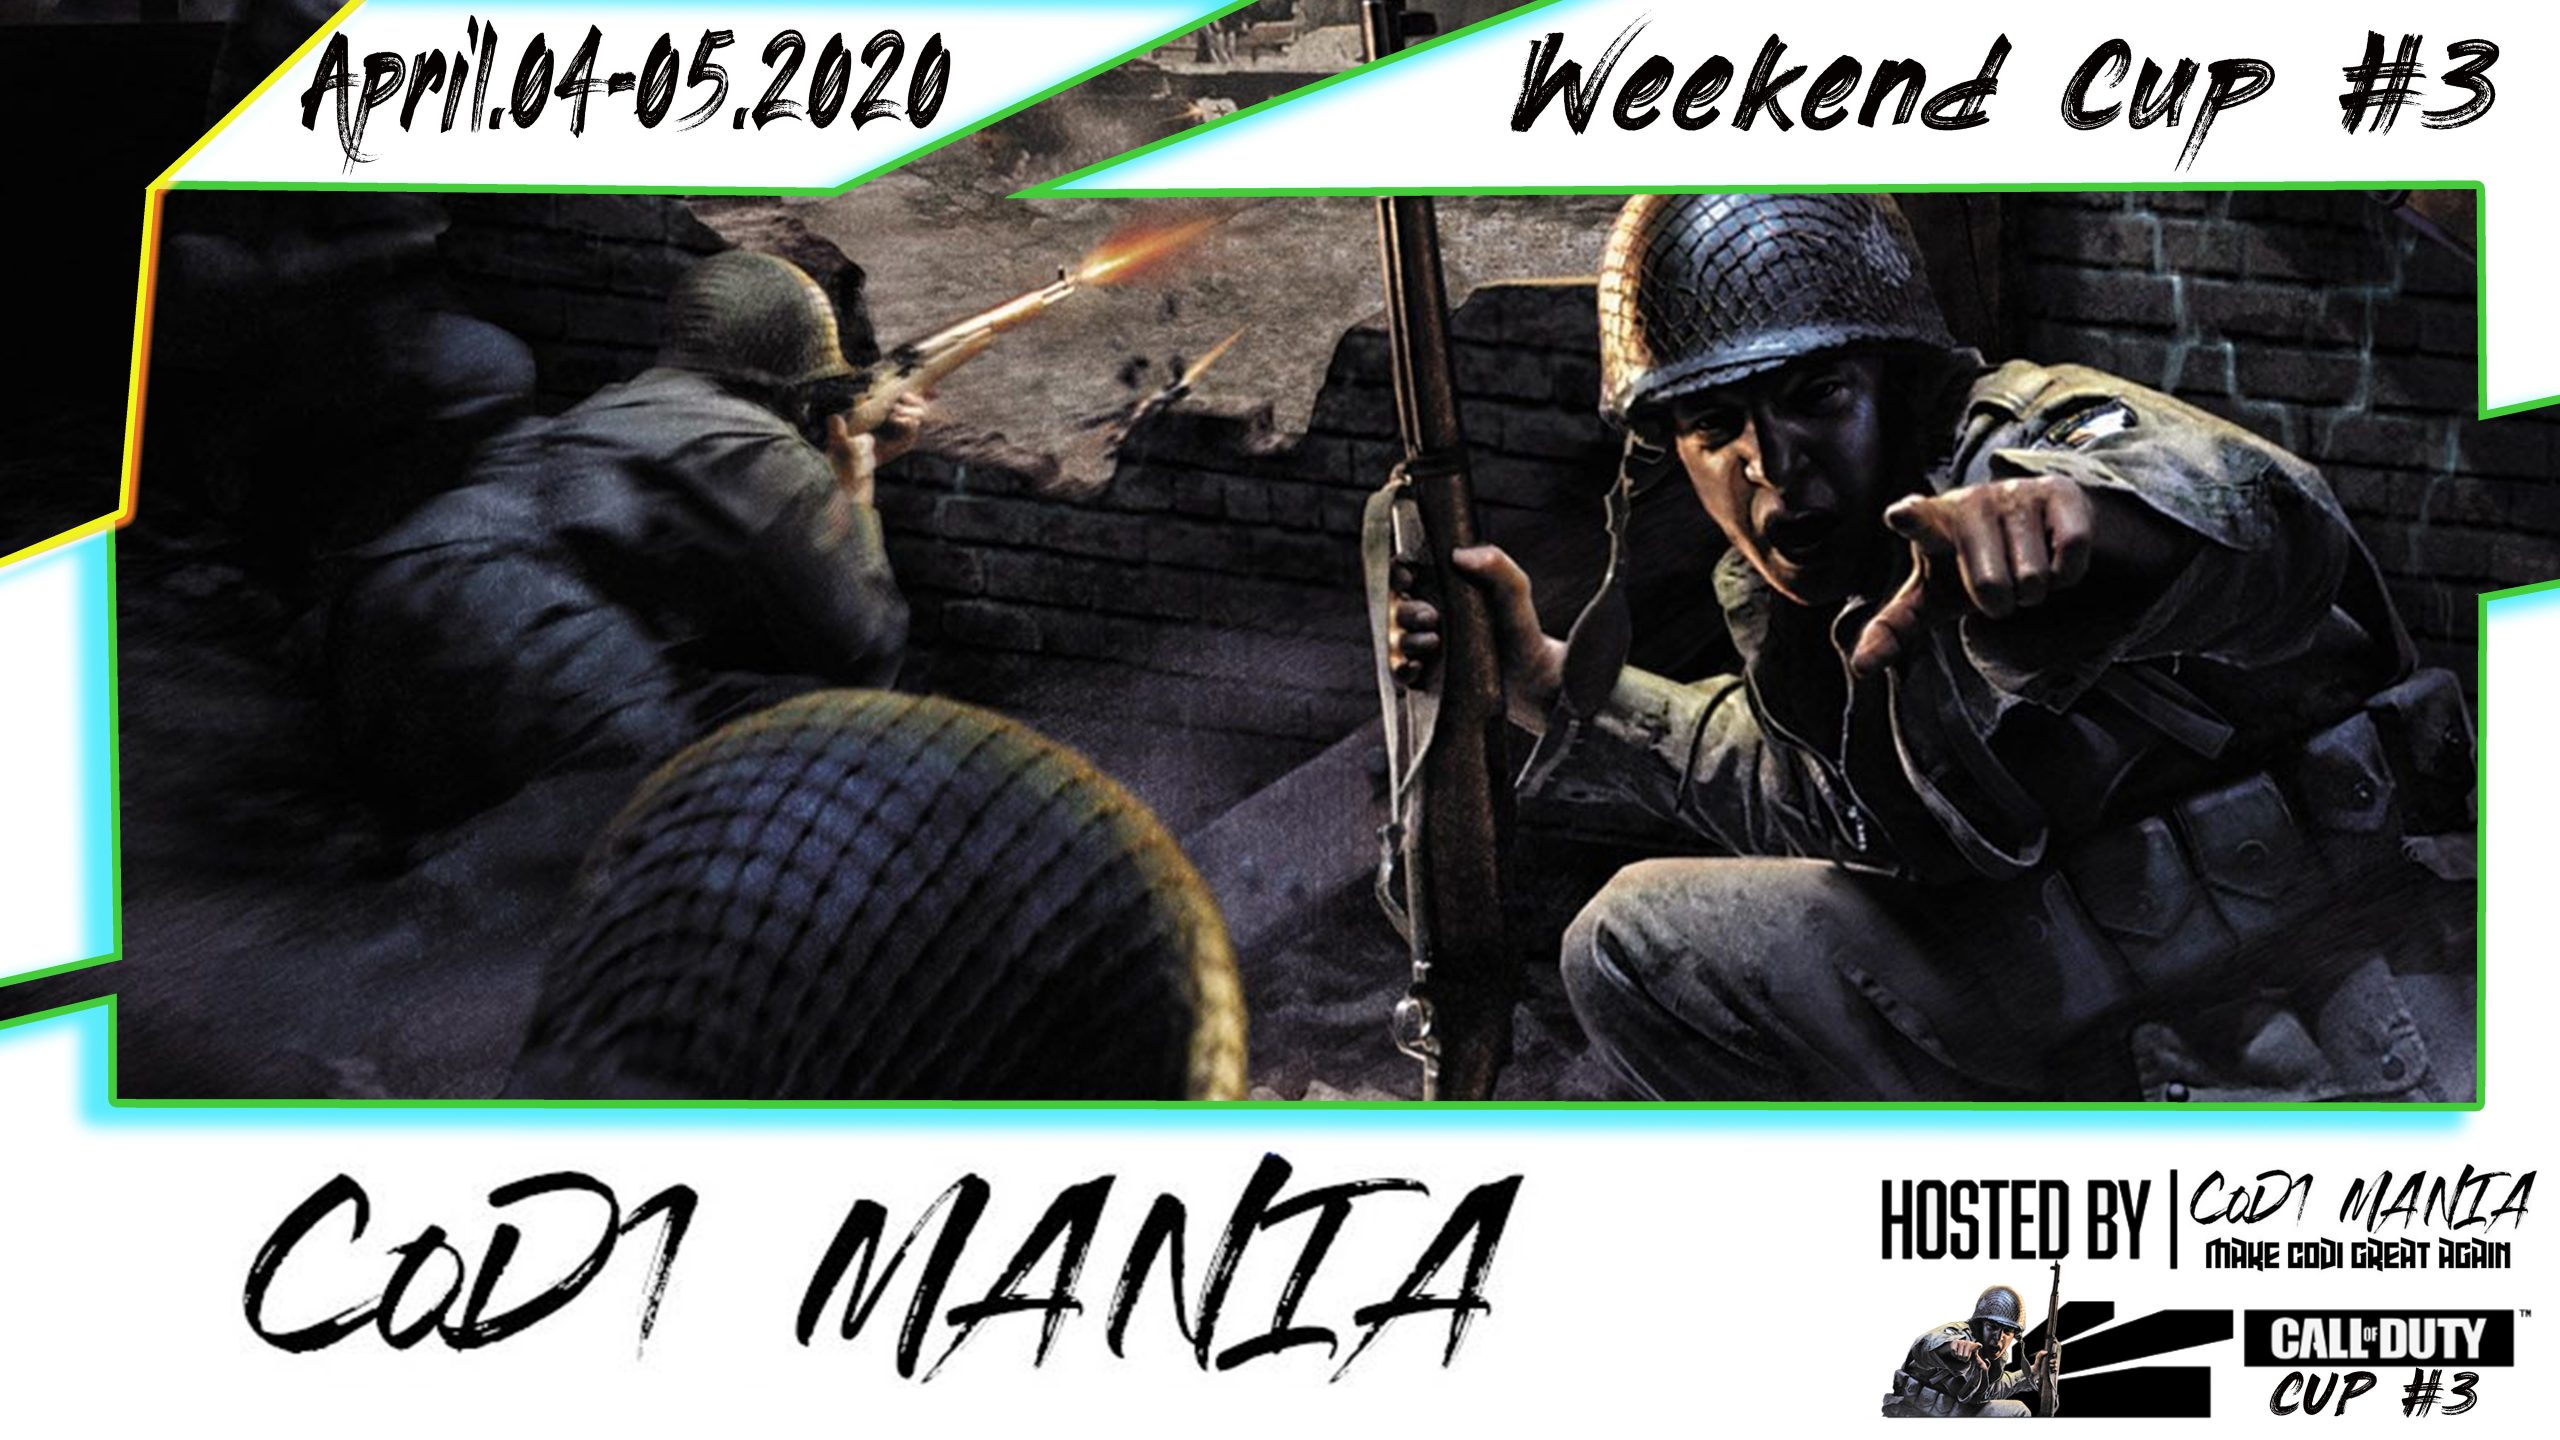 CoD1Mania Cup #3 – Weekend cup